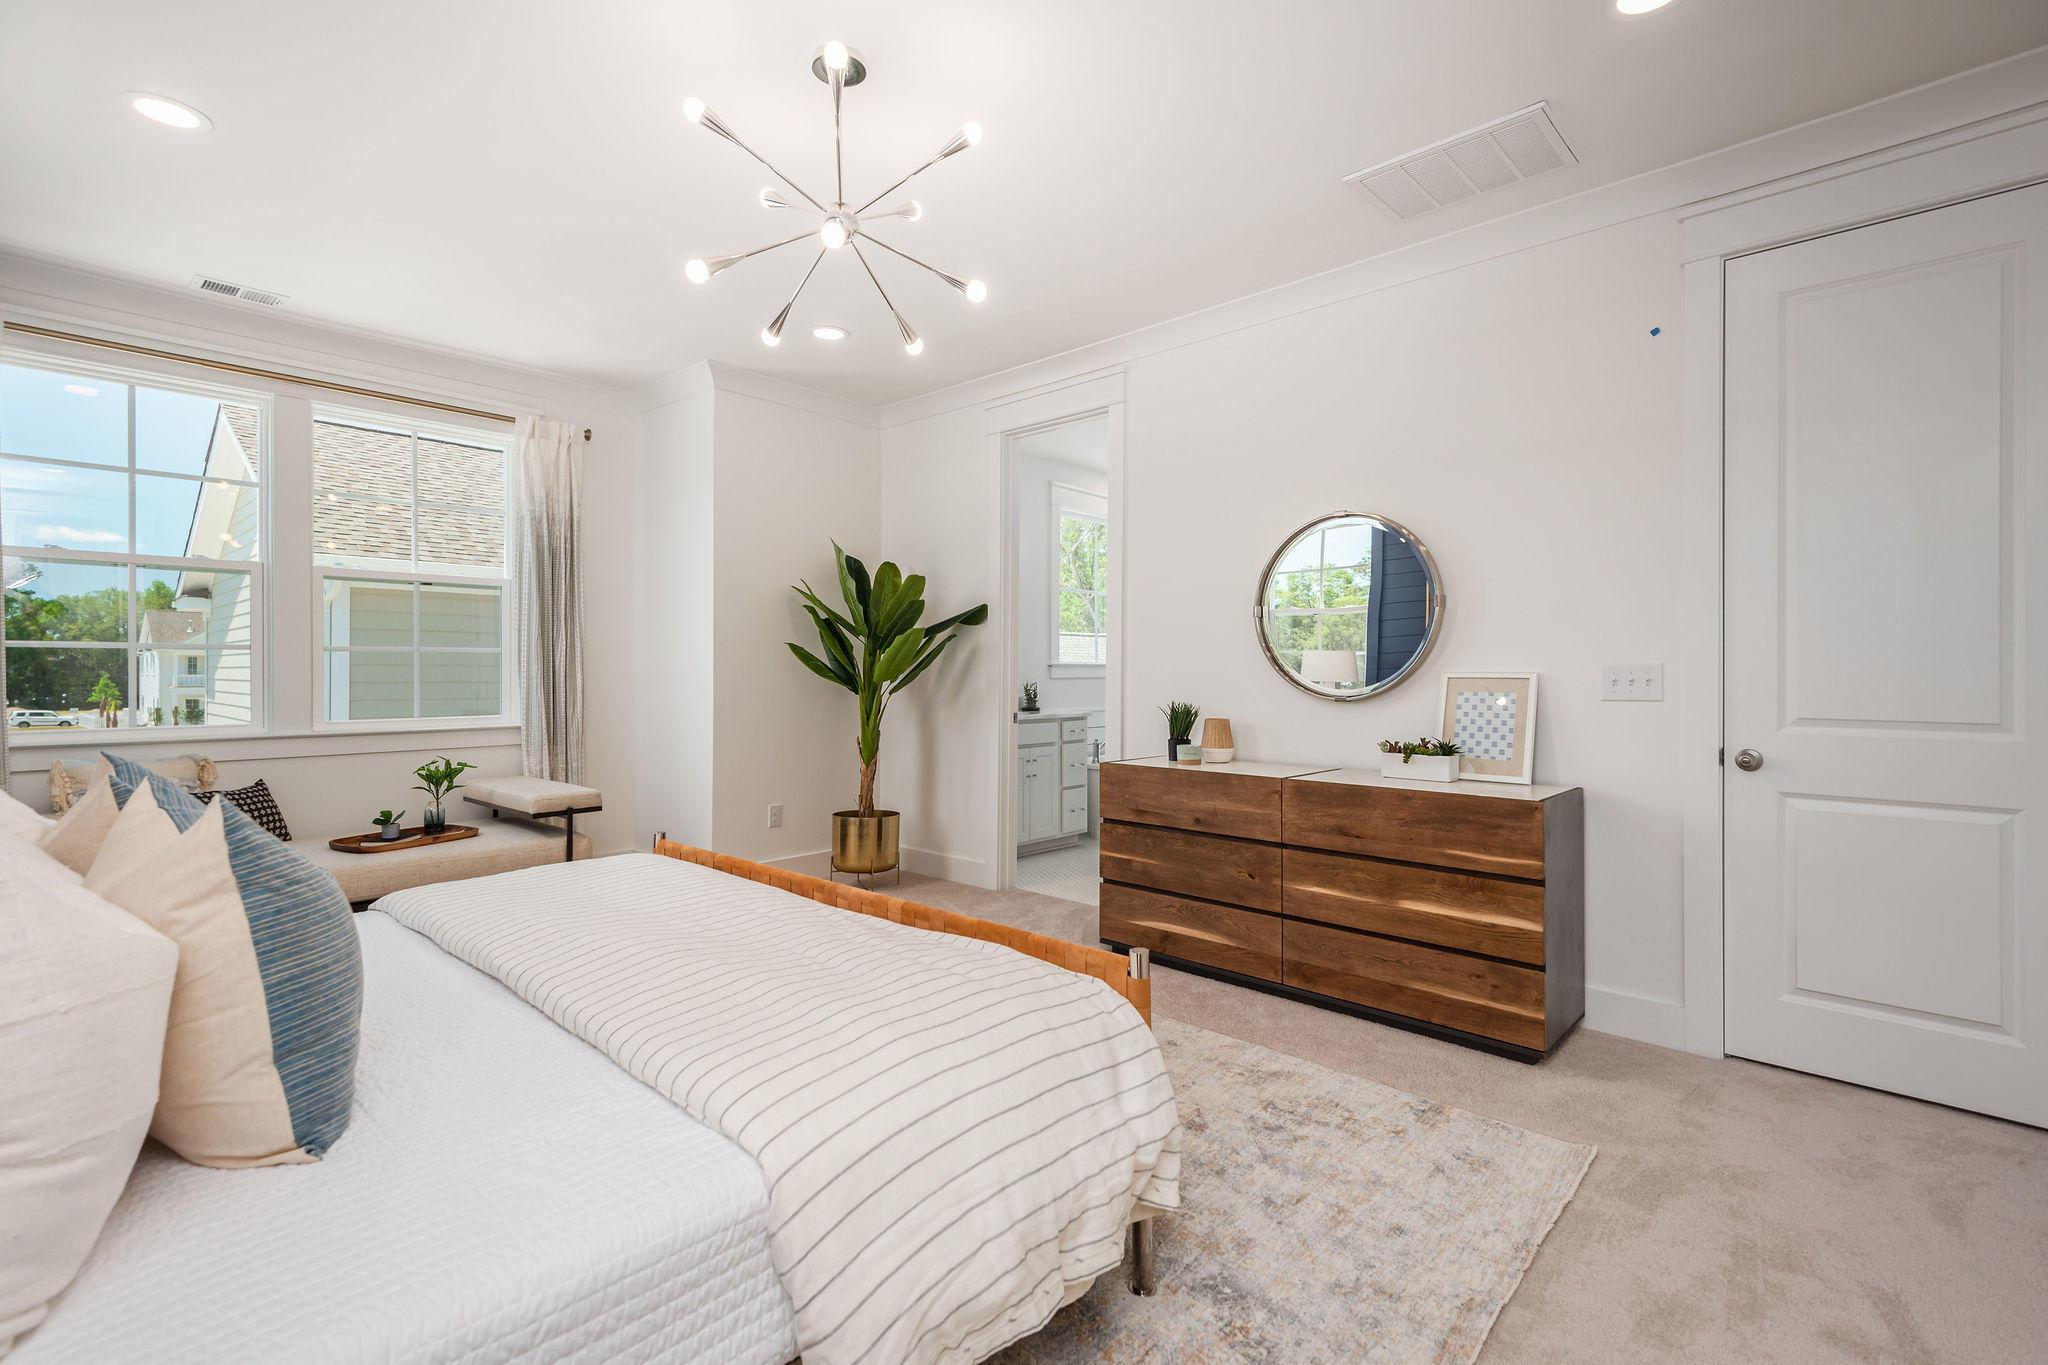 Midtown Homes For Sale - 1533 Kepley, Mount Pleasant, SC - 17